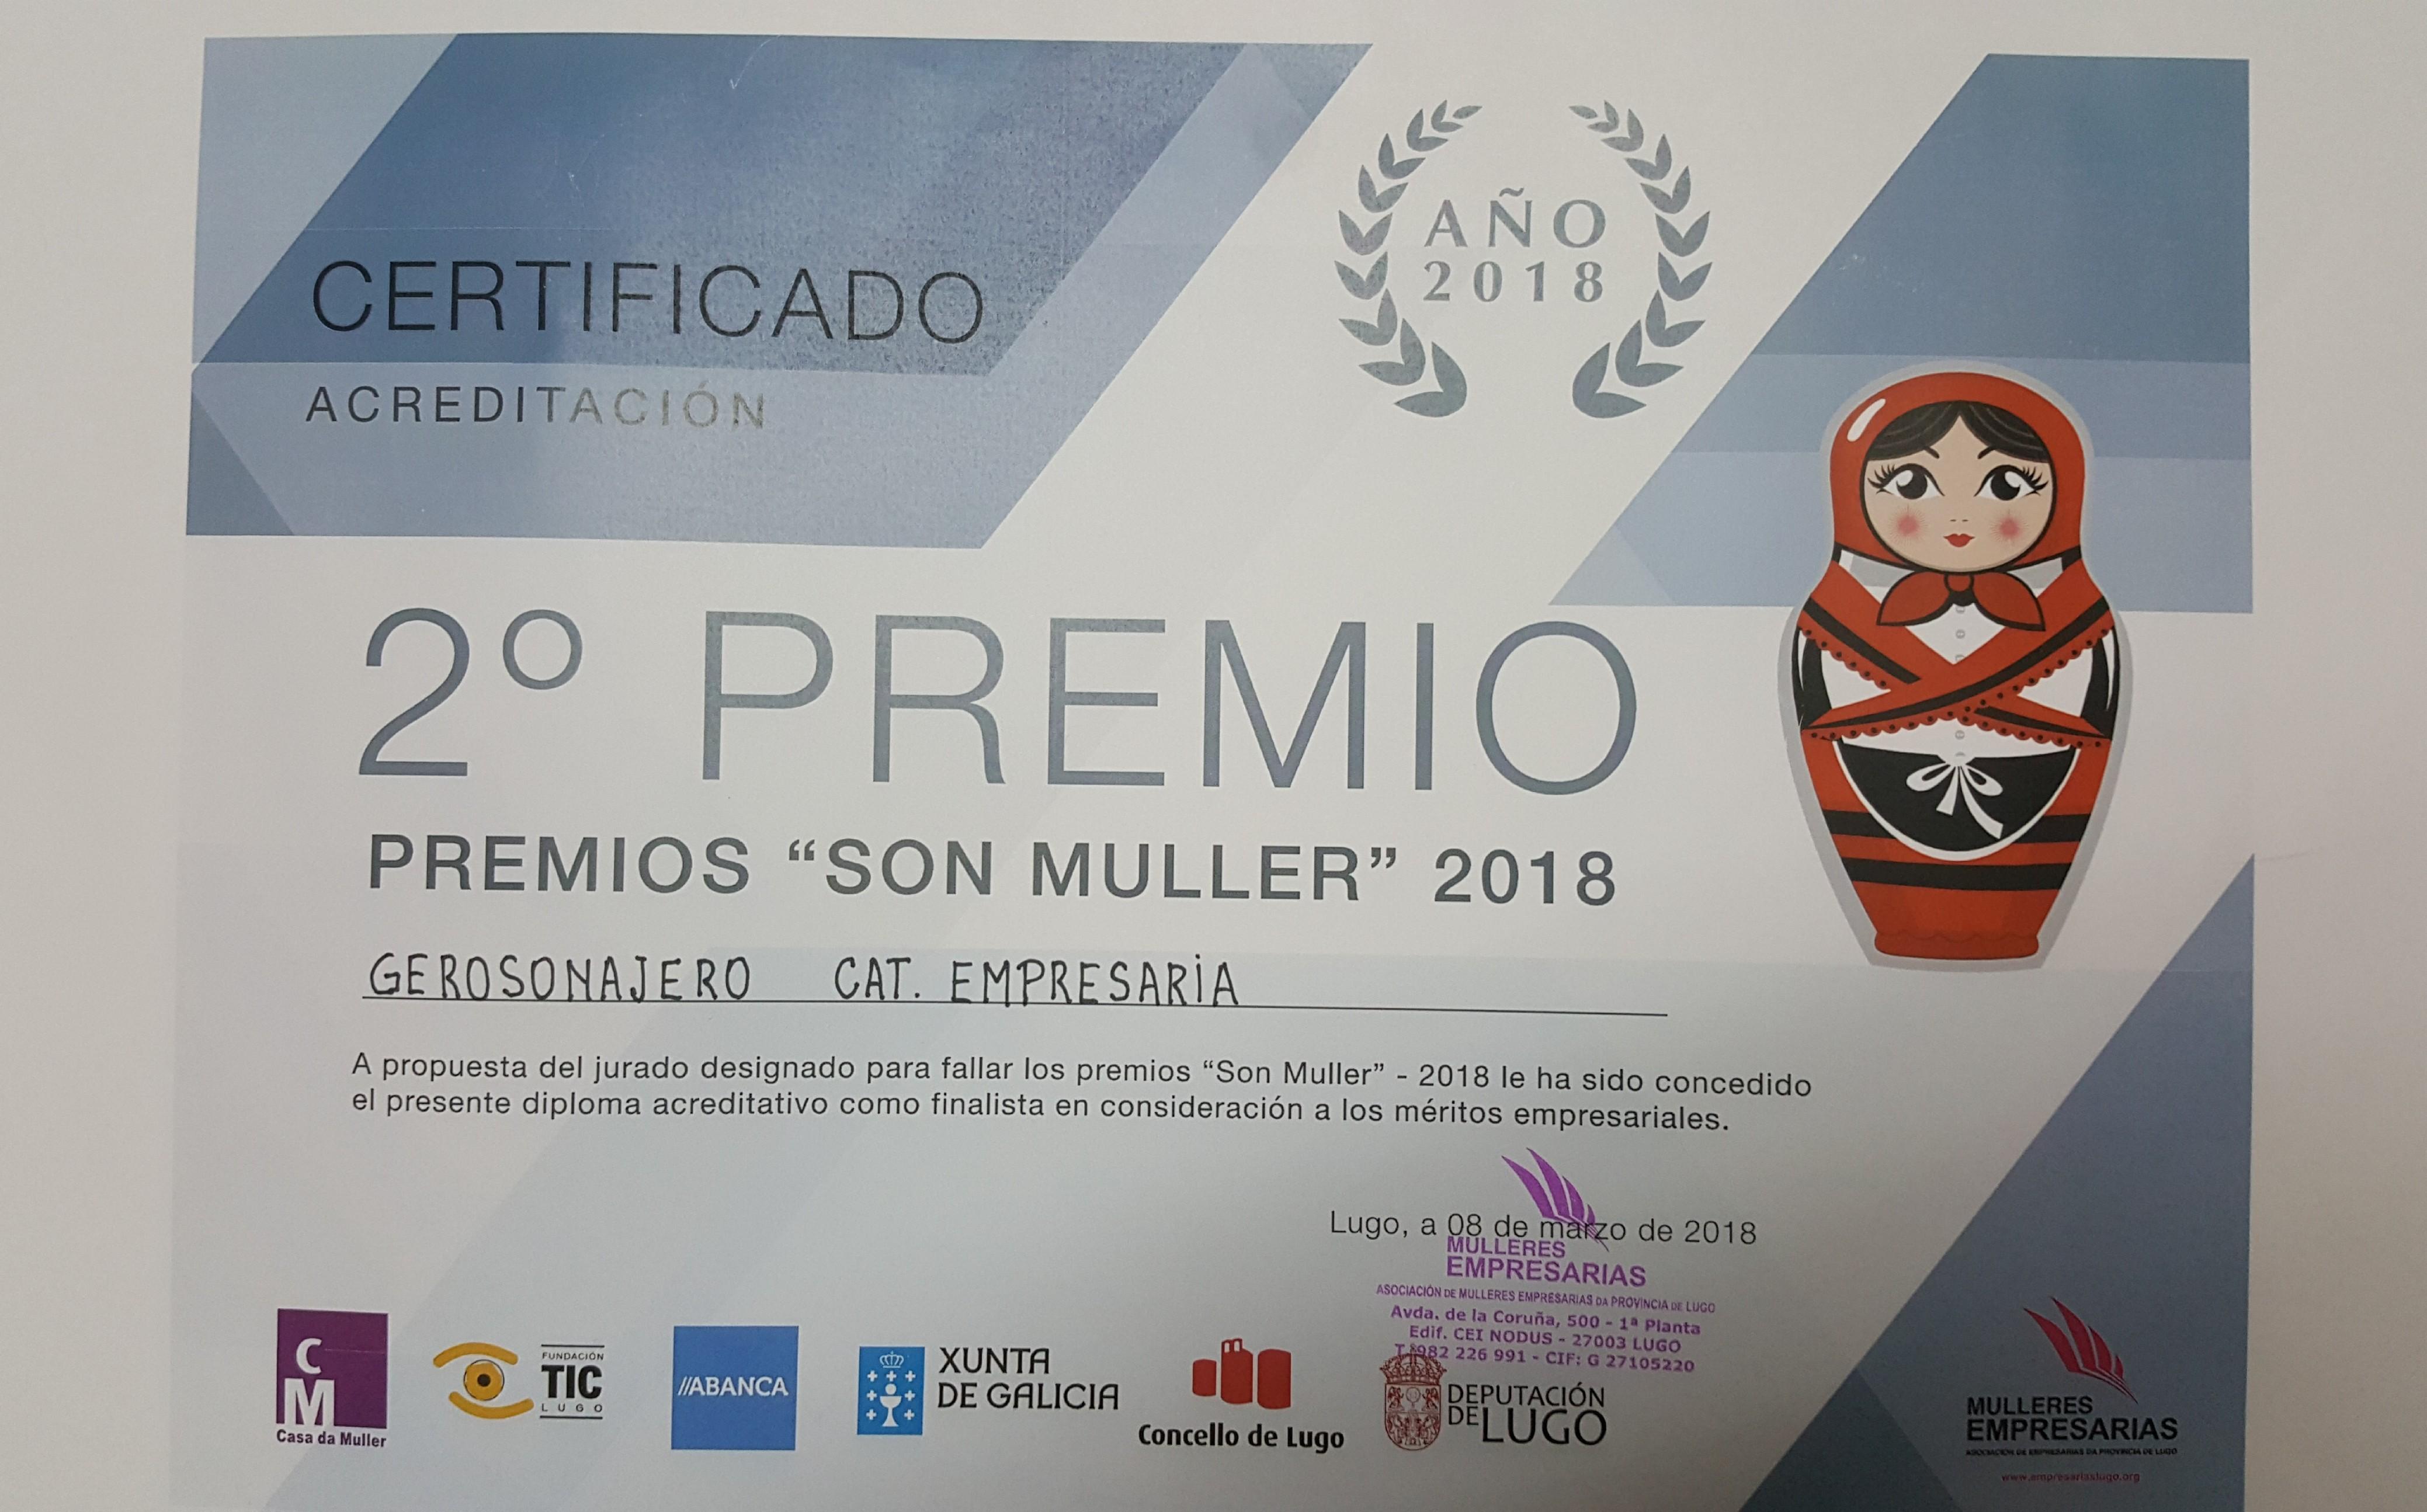 www.gerosonajero.com